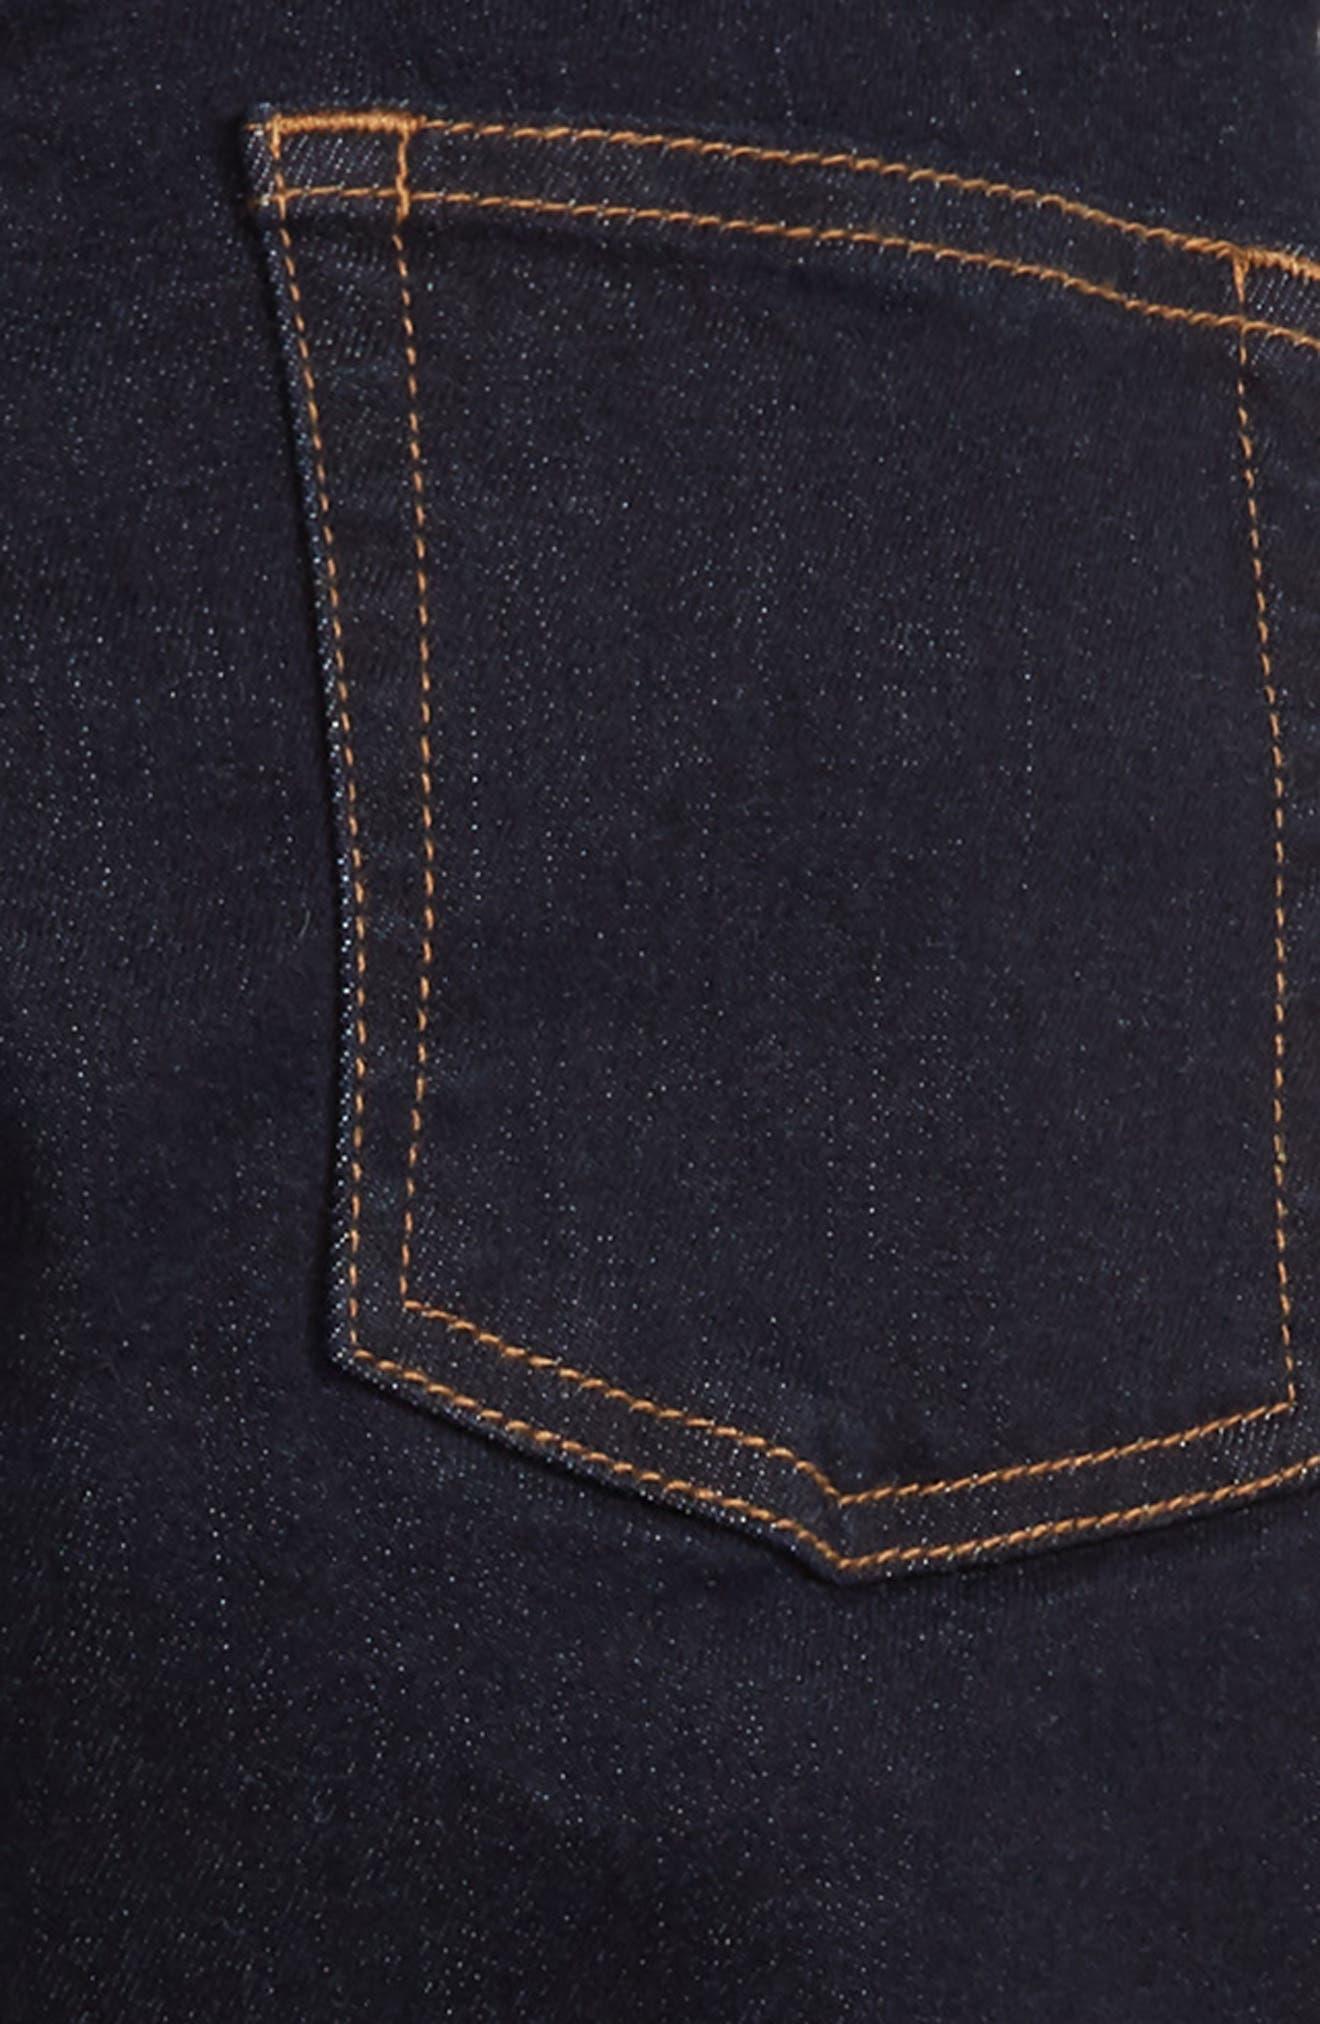 Runaround Slim Jeans,                             Alternate thumbnail 3, color,                             400